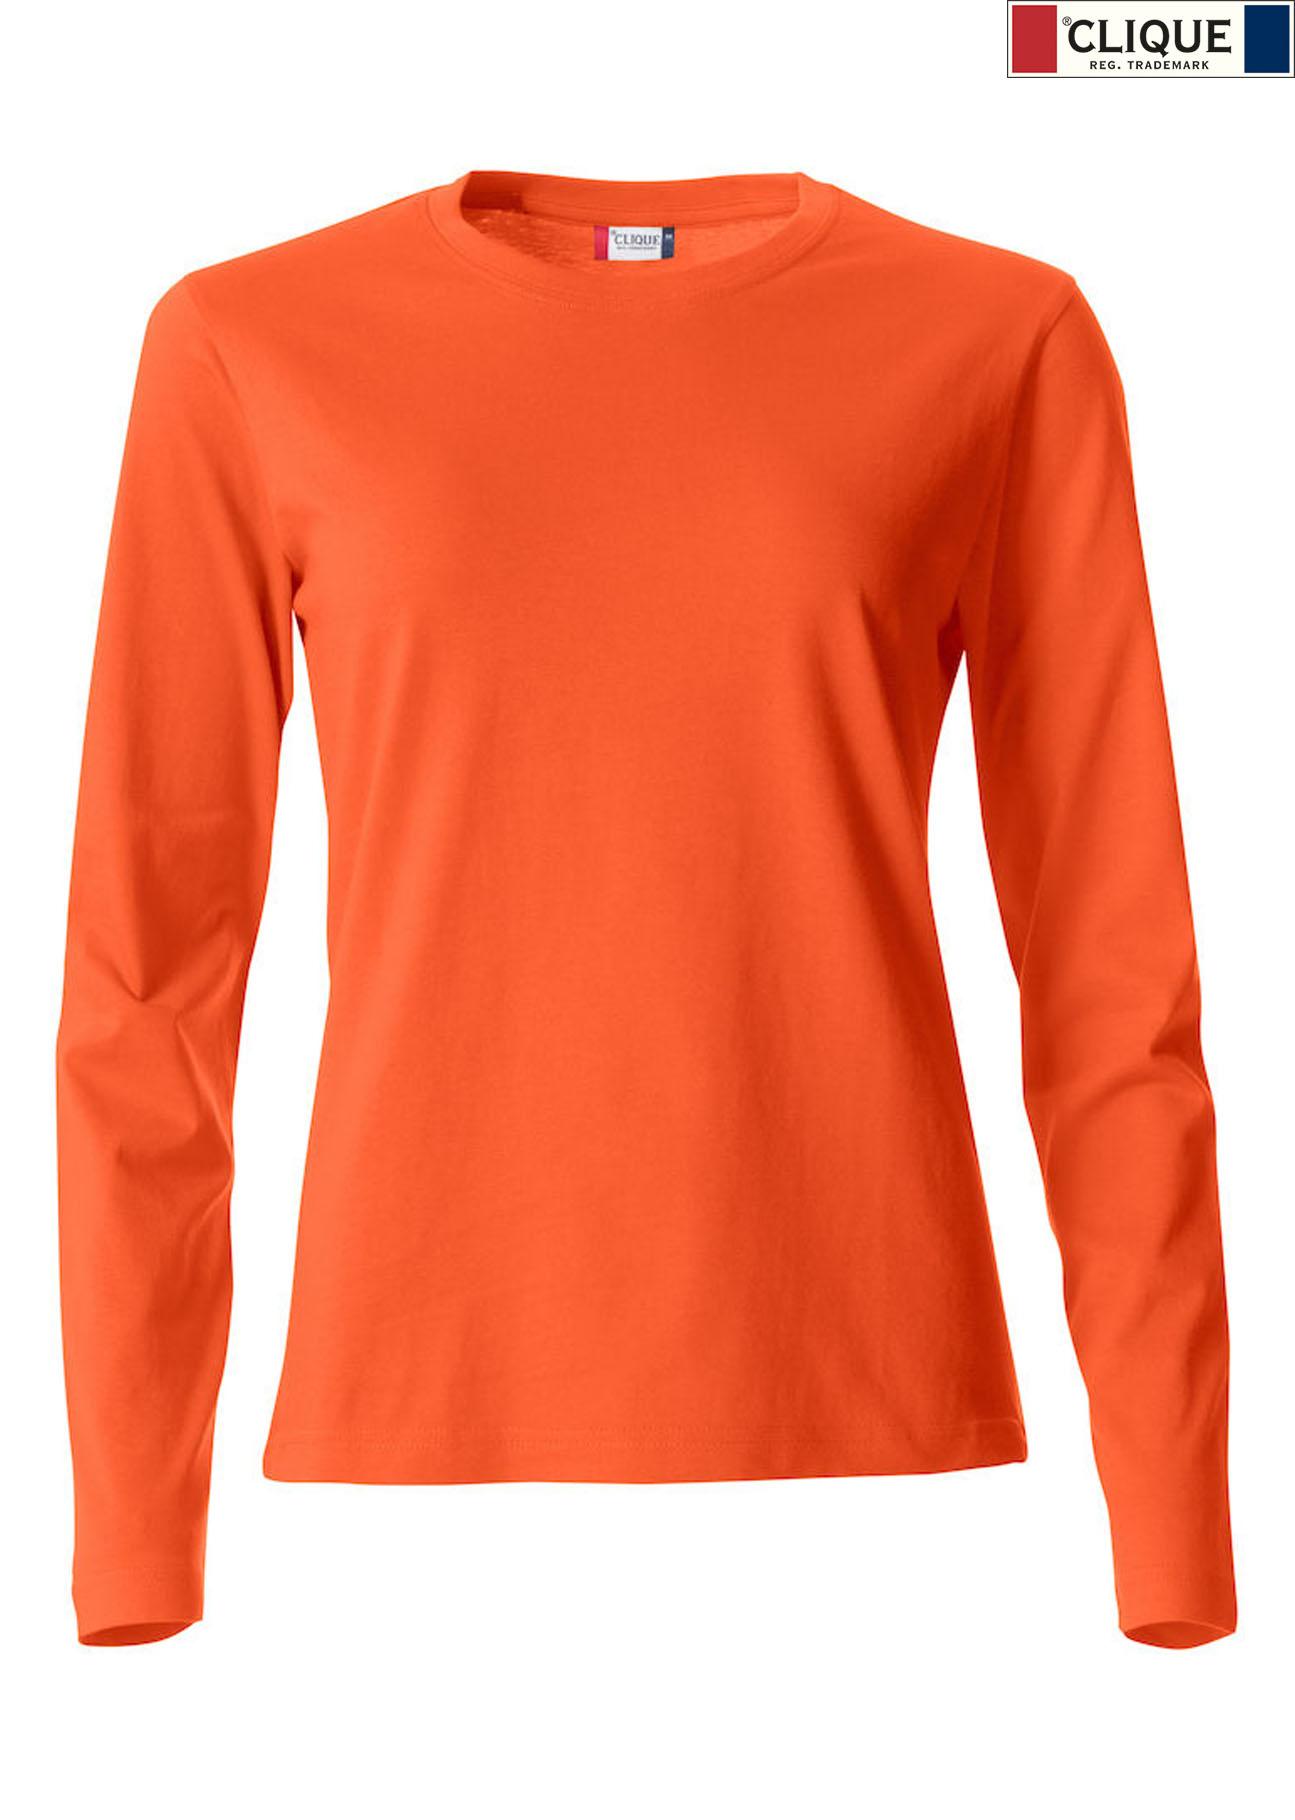 buy cheap 7bef0 178db Clique, Basic Langarm T-Shirt, günstig bedrucken « Merkur ...